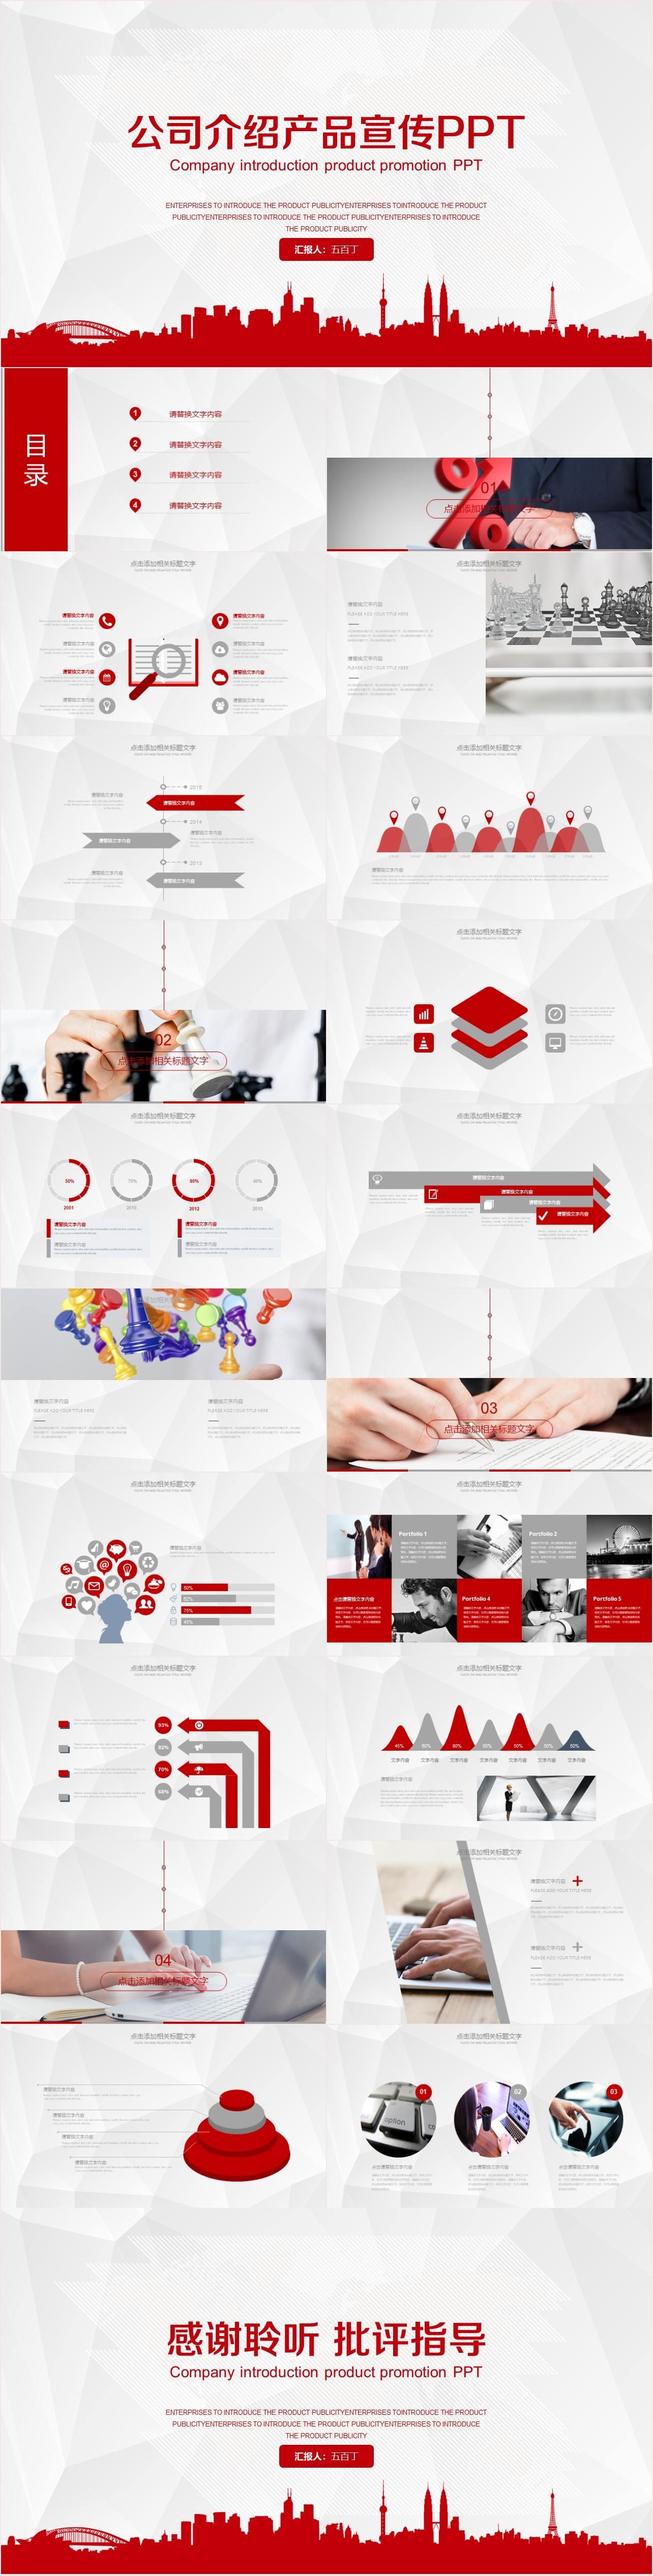 CL0101 企业介绍 公司介绍 企业宣传 产品宣传PPT模板